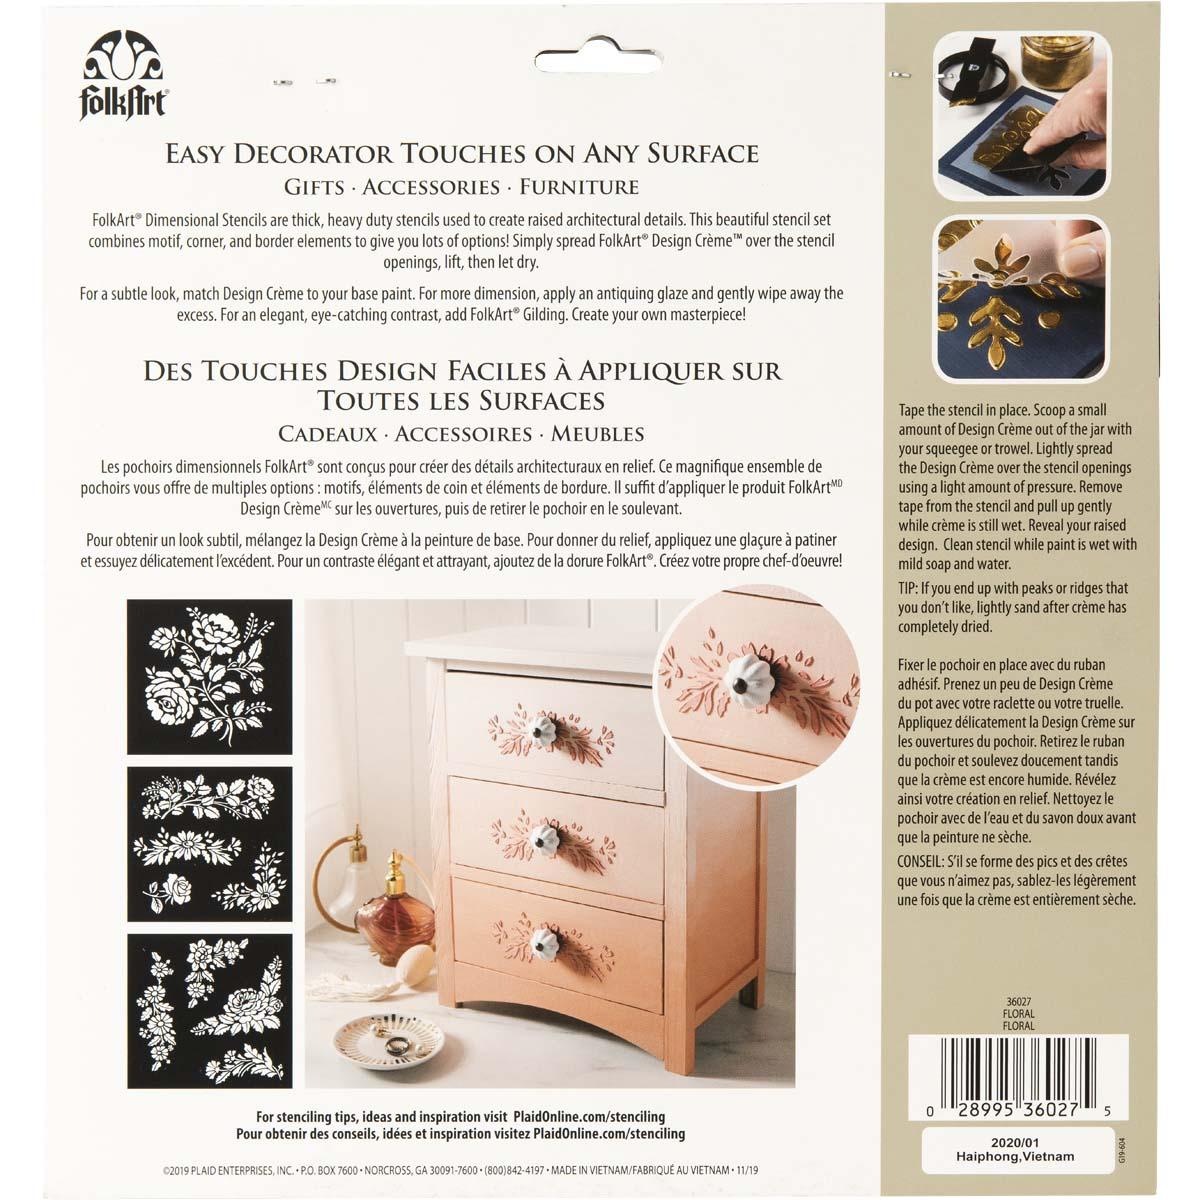 FolkArt ® Dimensional Stencil Pack - Floral, 3 pc. - 36027